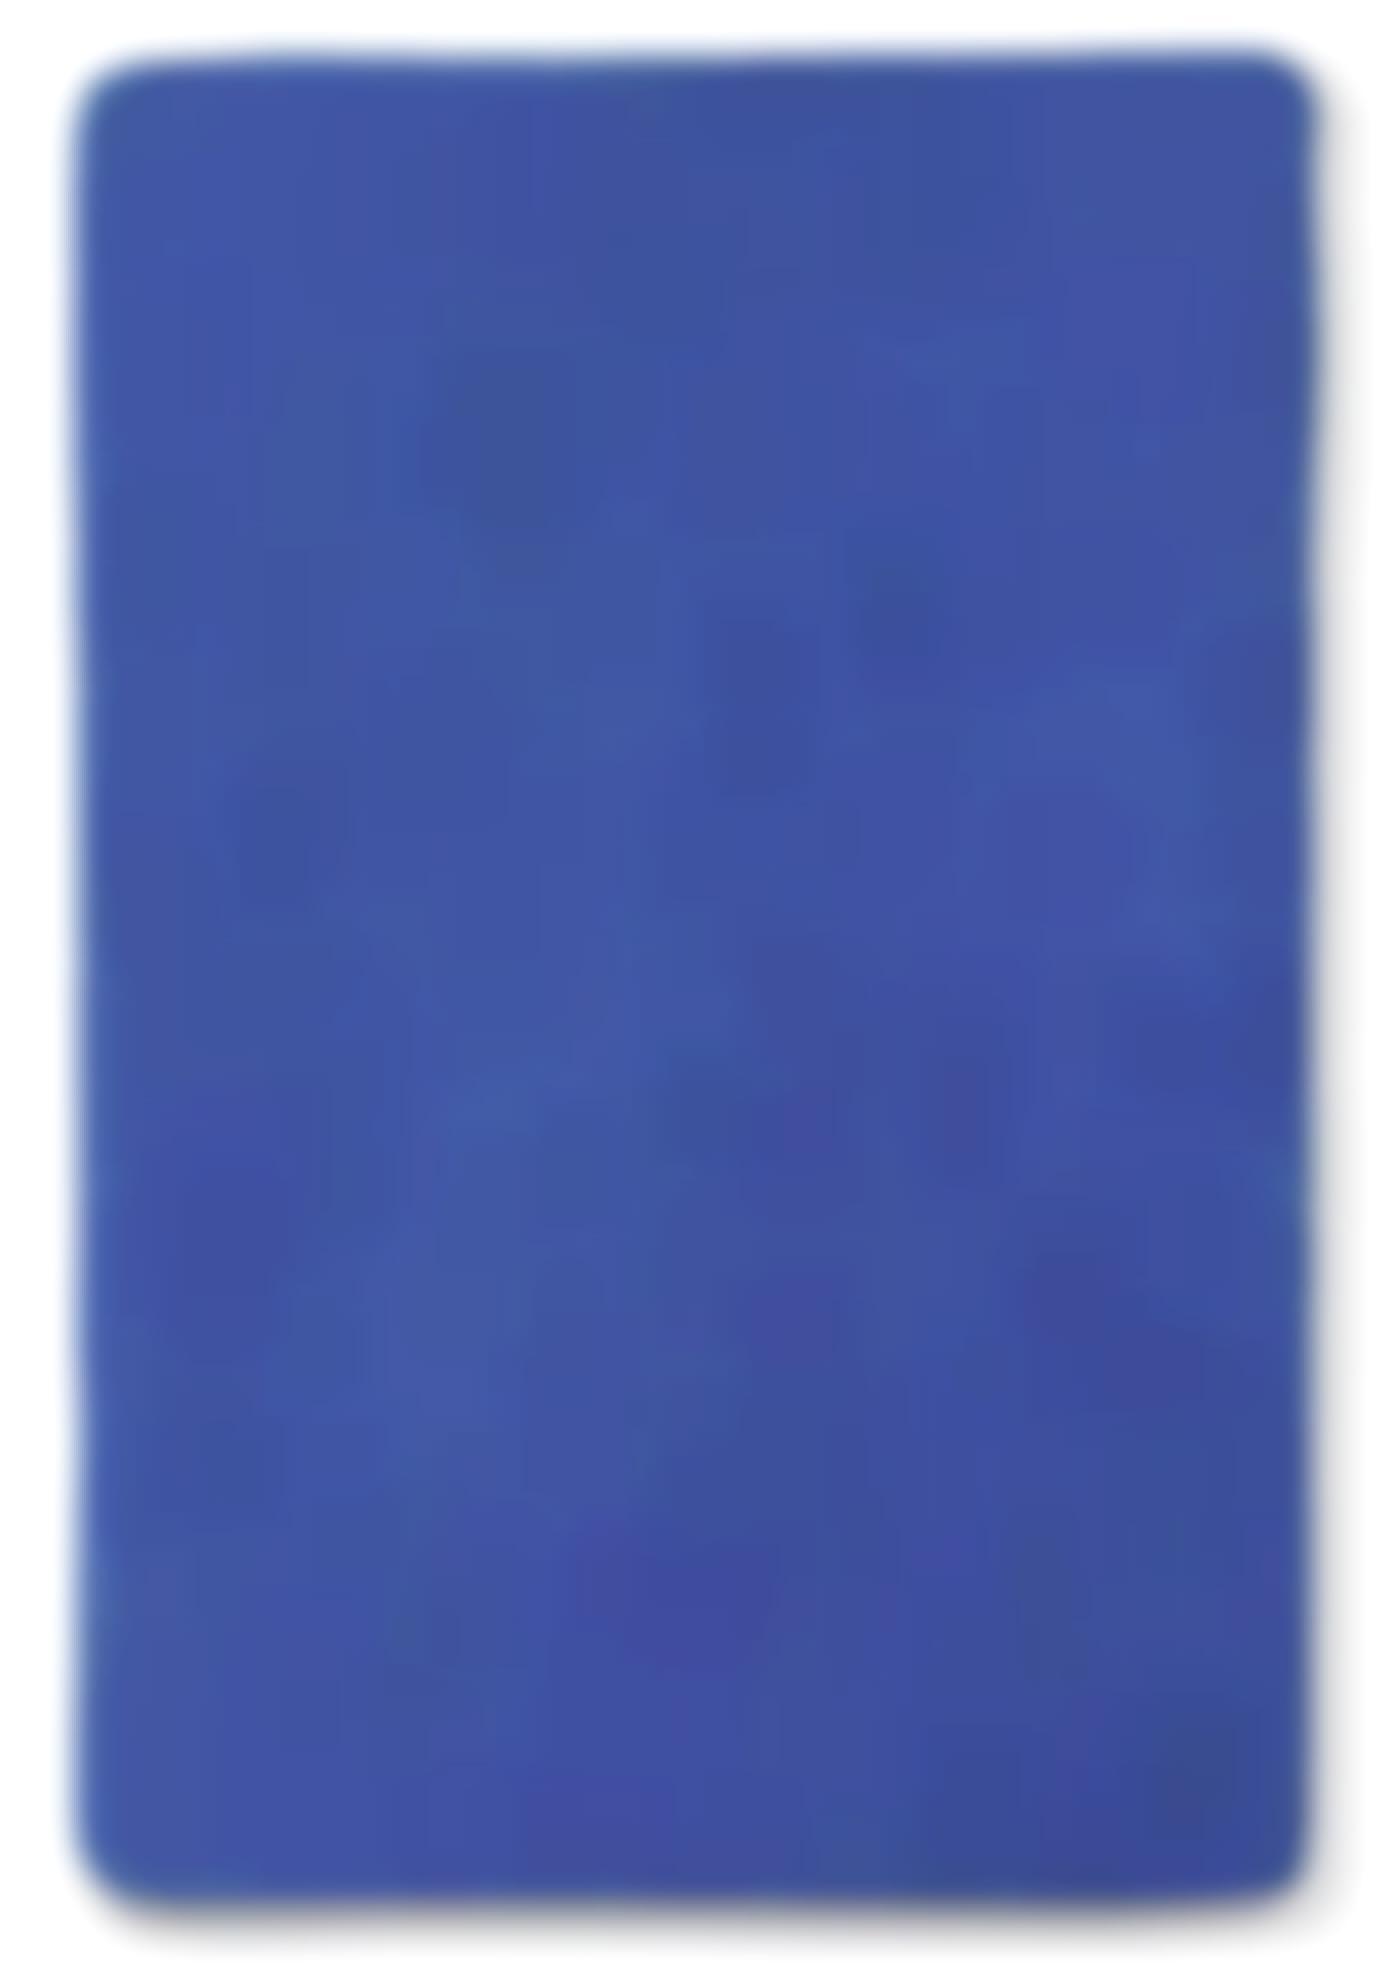 Yves Klein-Monochrome Bleu Sans Titre, (Ikb 279)-1957